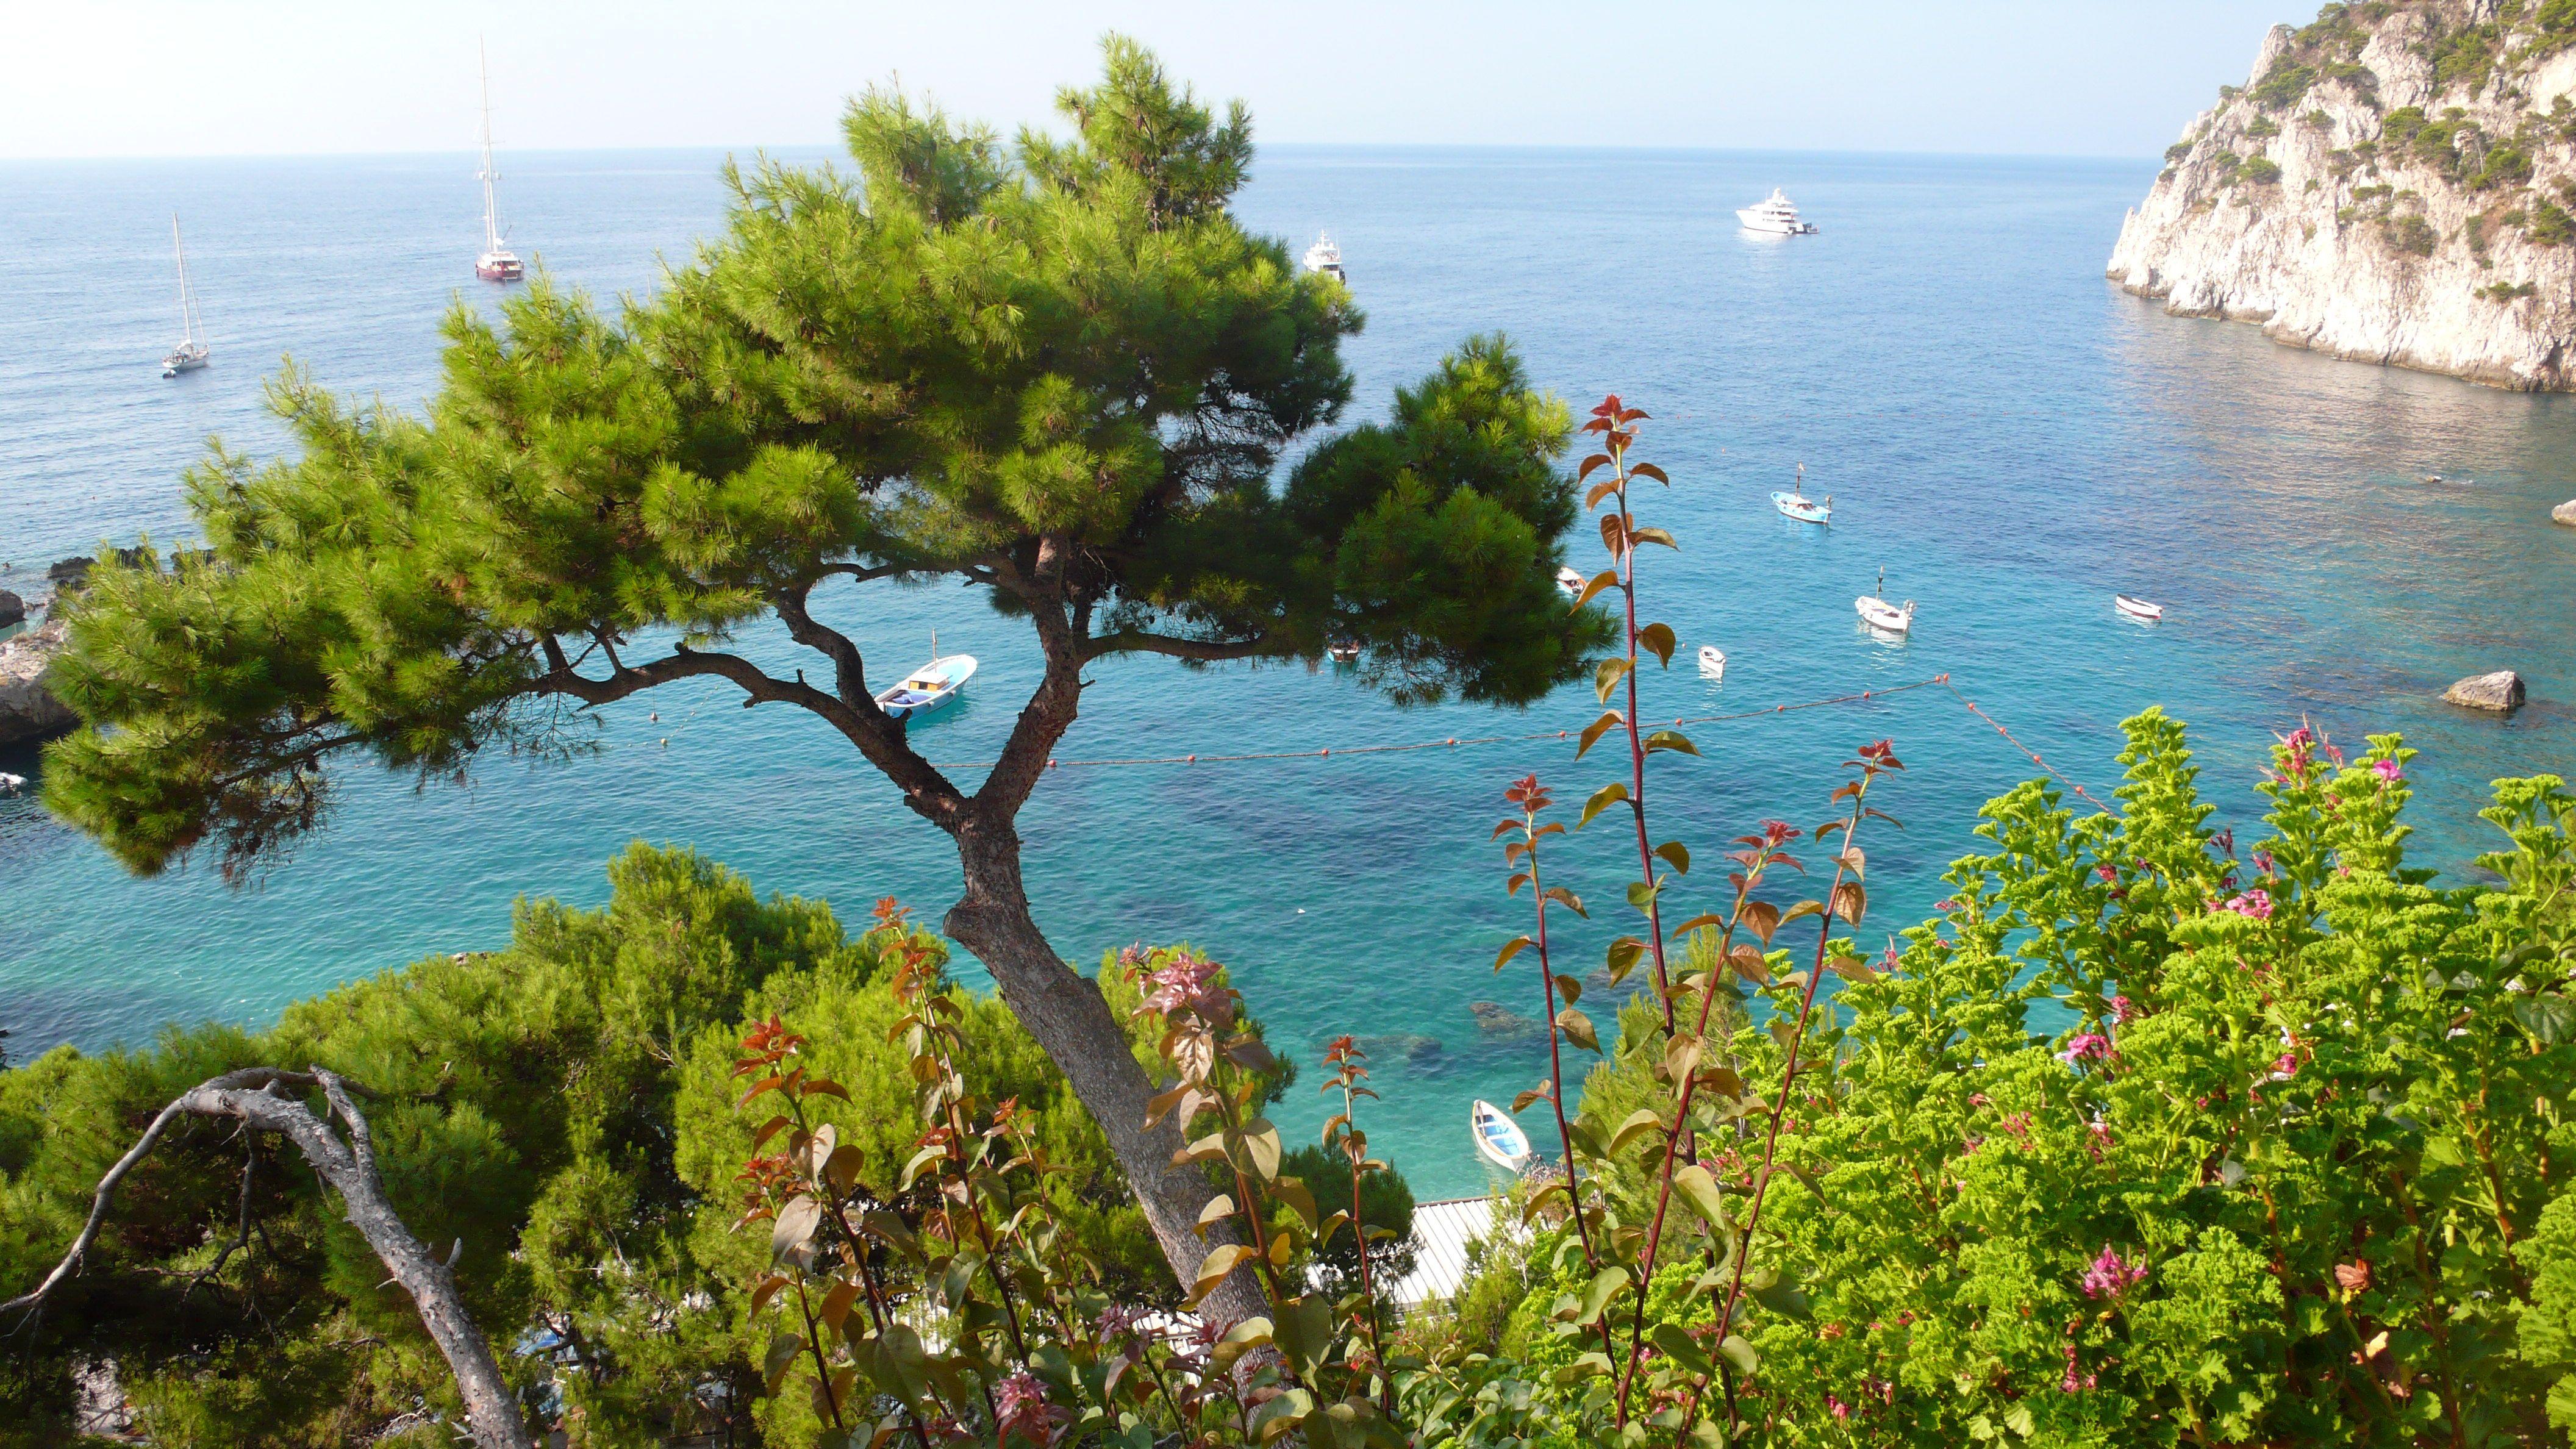 Marina Grande, Insel Capri, Golf von Neapel, Kampanien ... |Capri Italy Golf